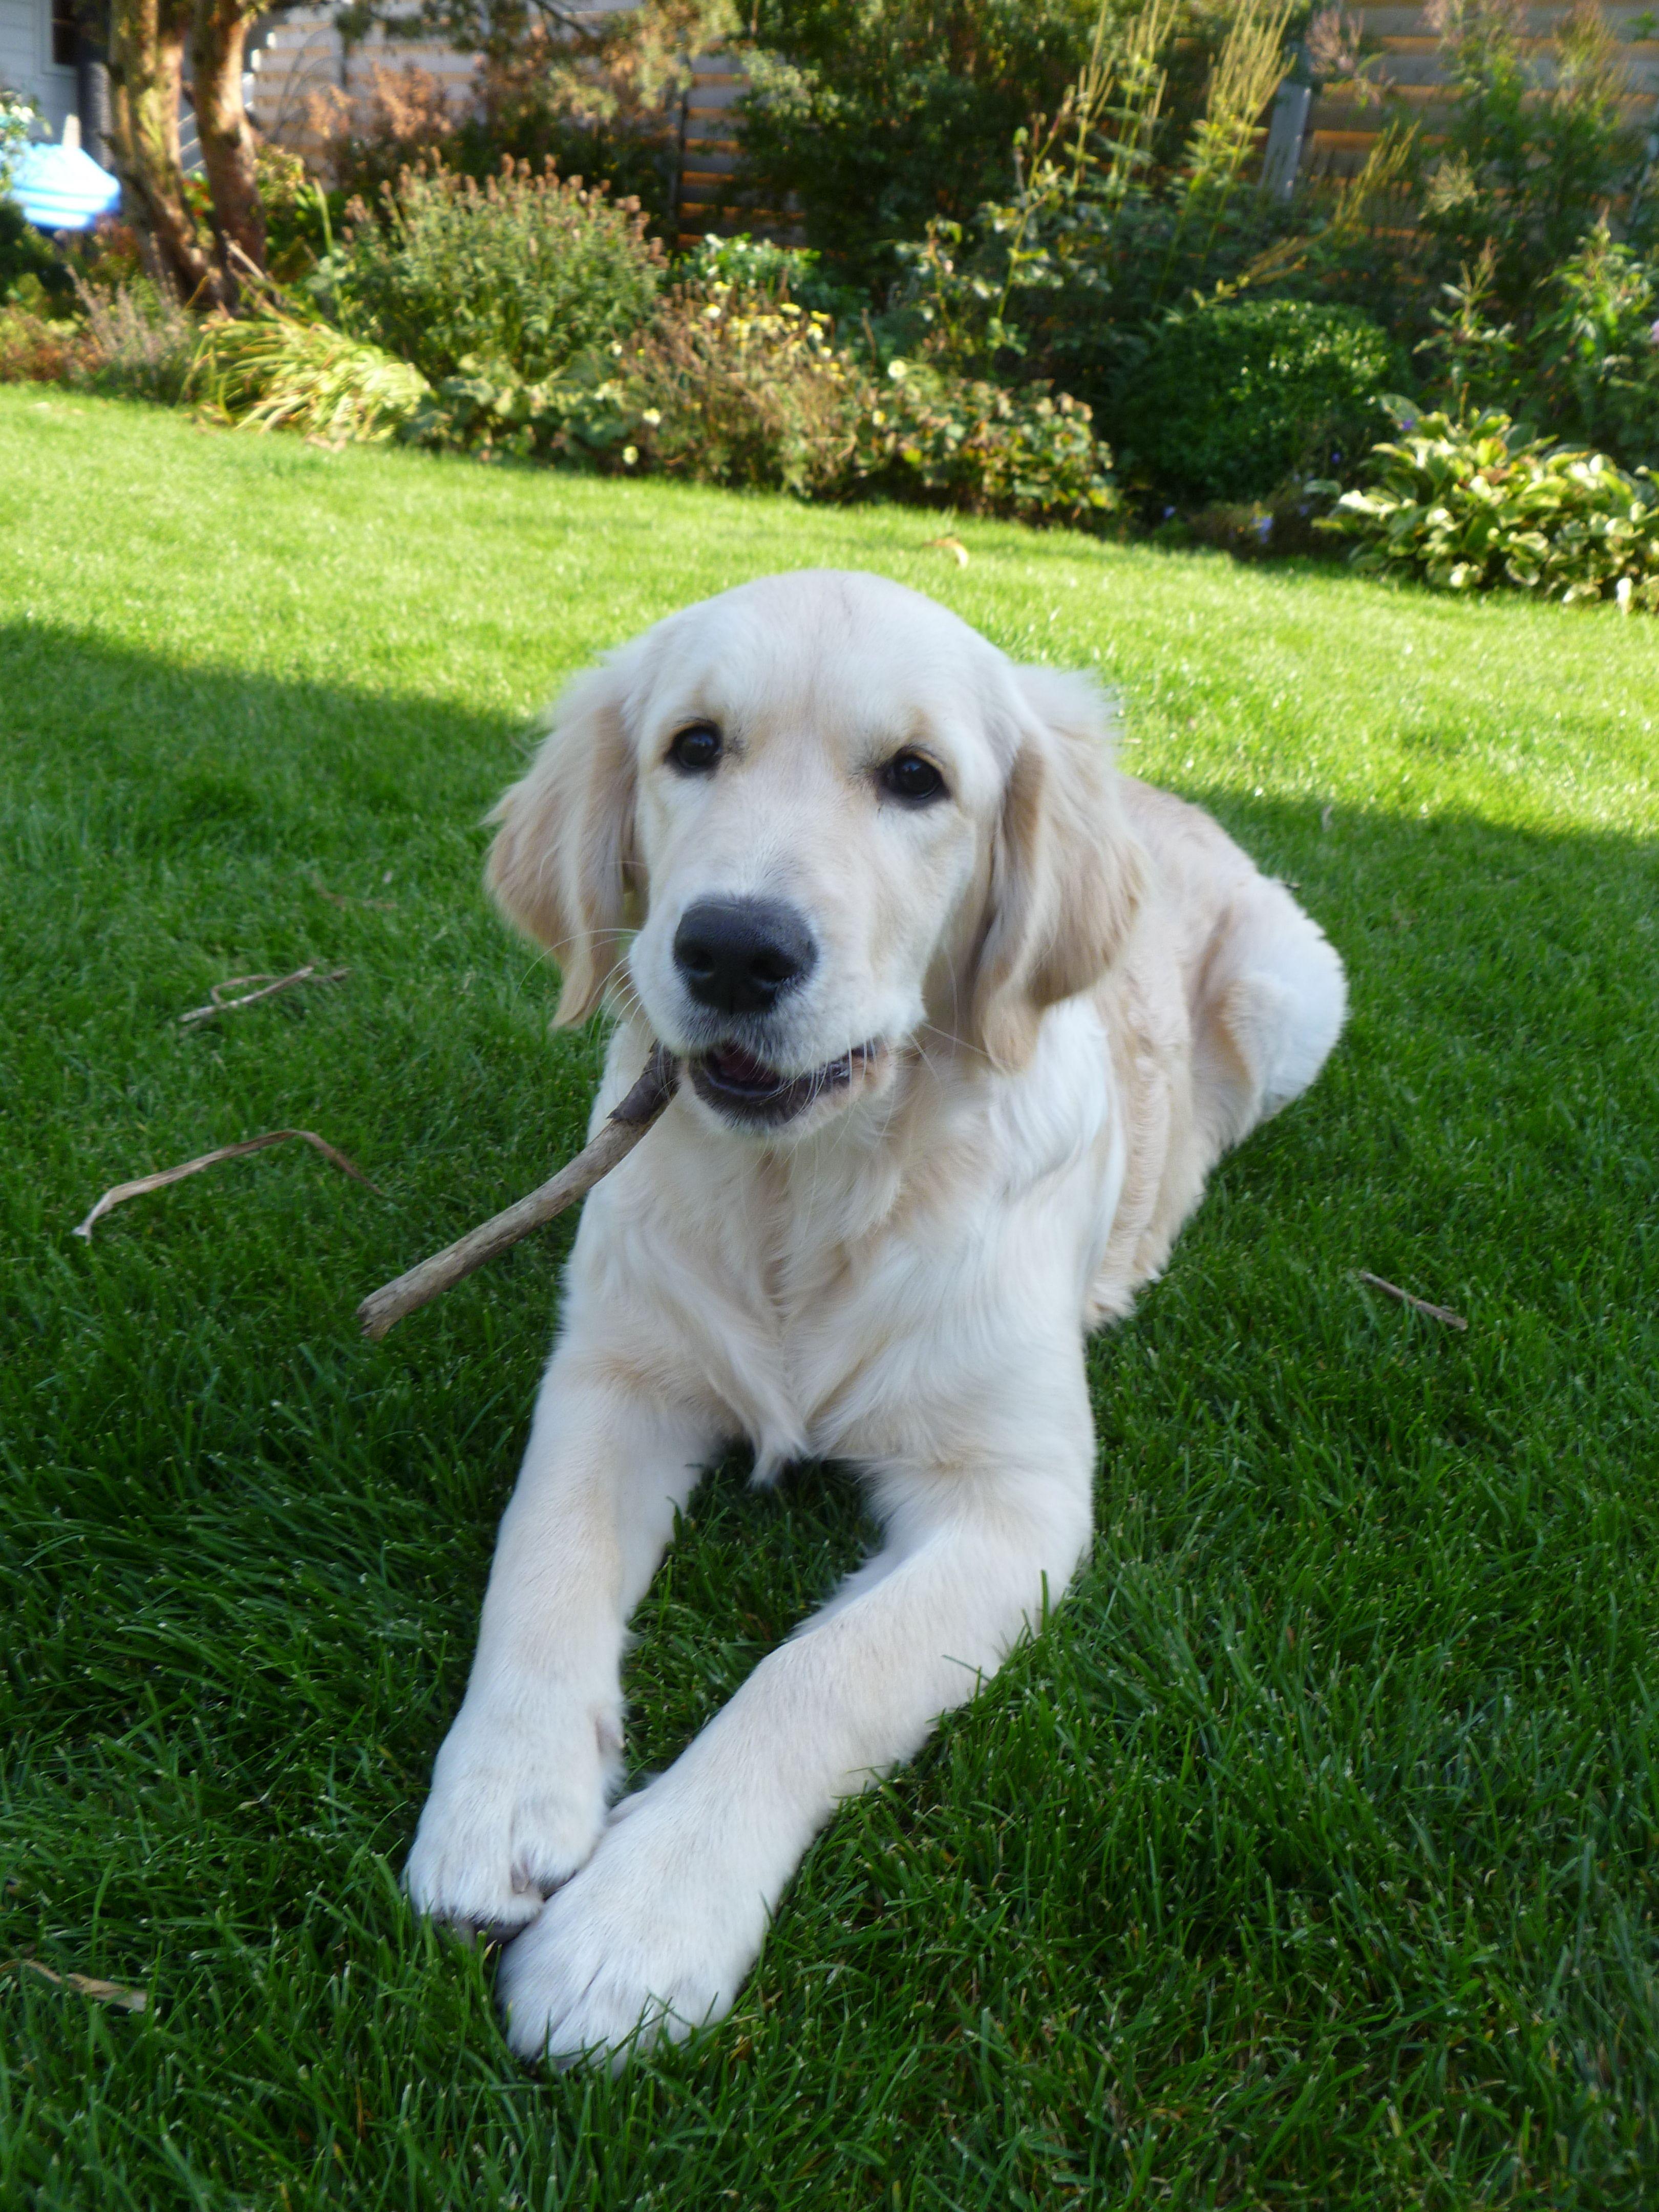 Miss mabel months wheatons golden retrievers mascotas